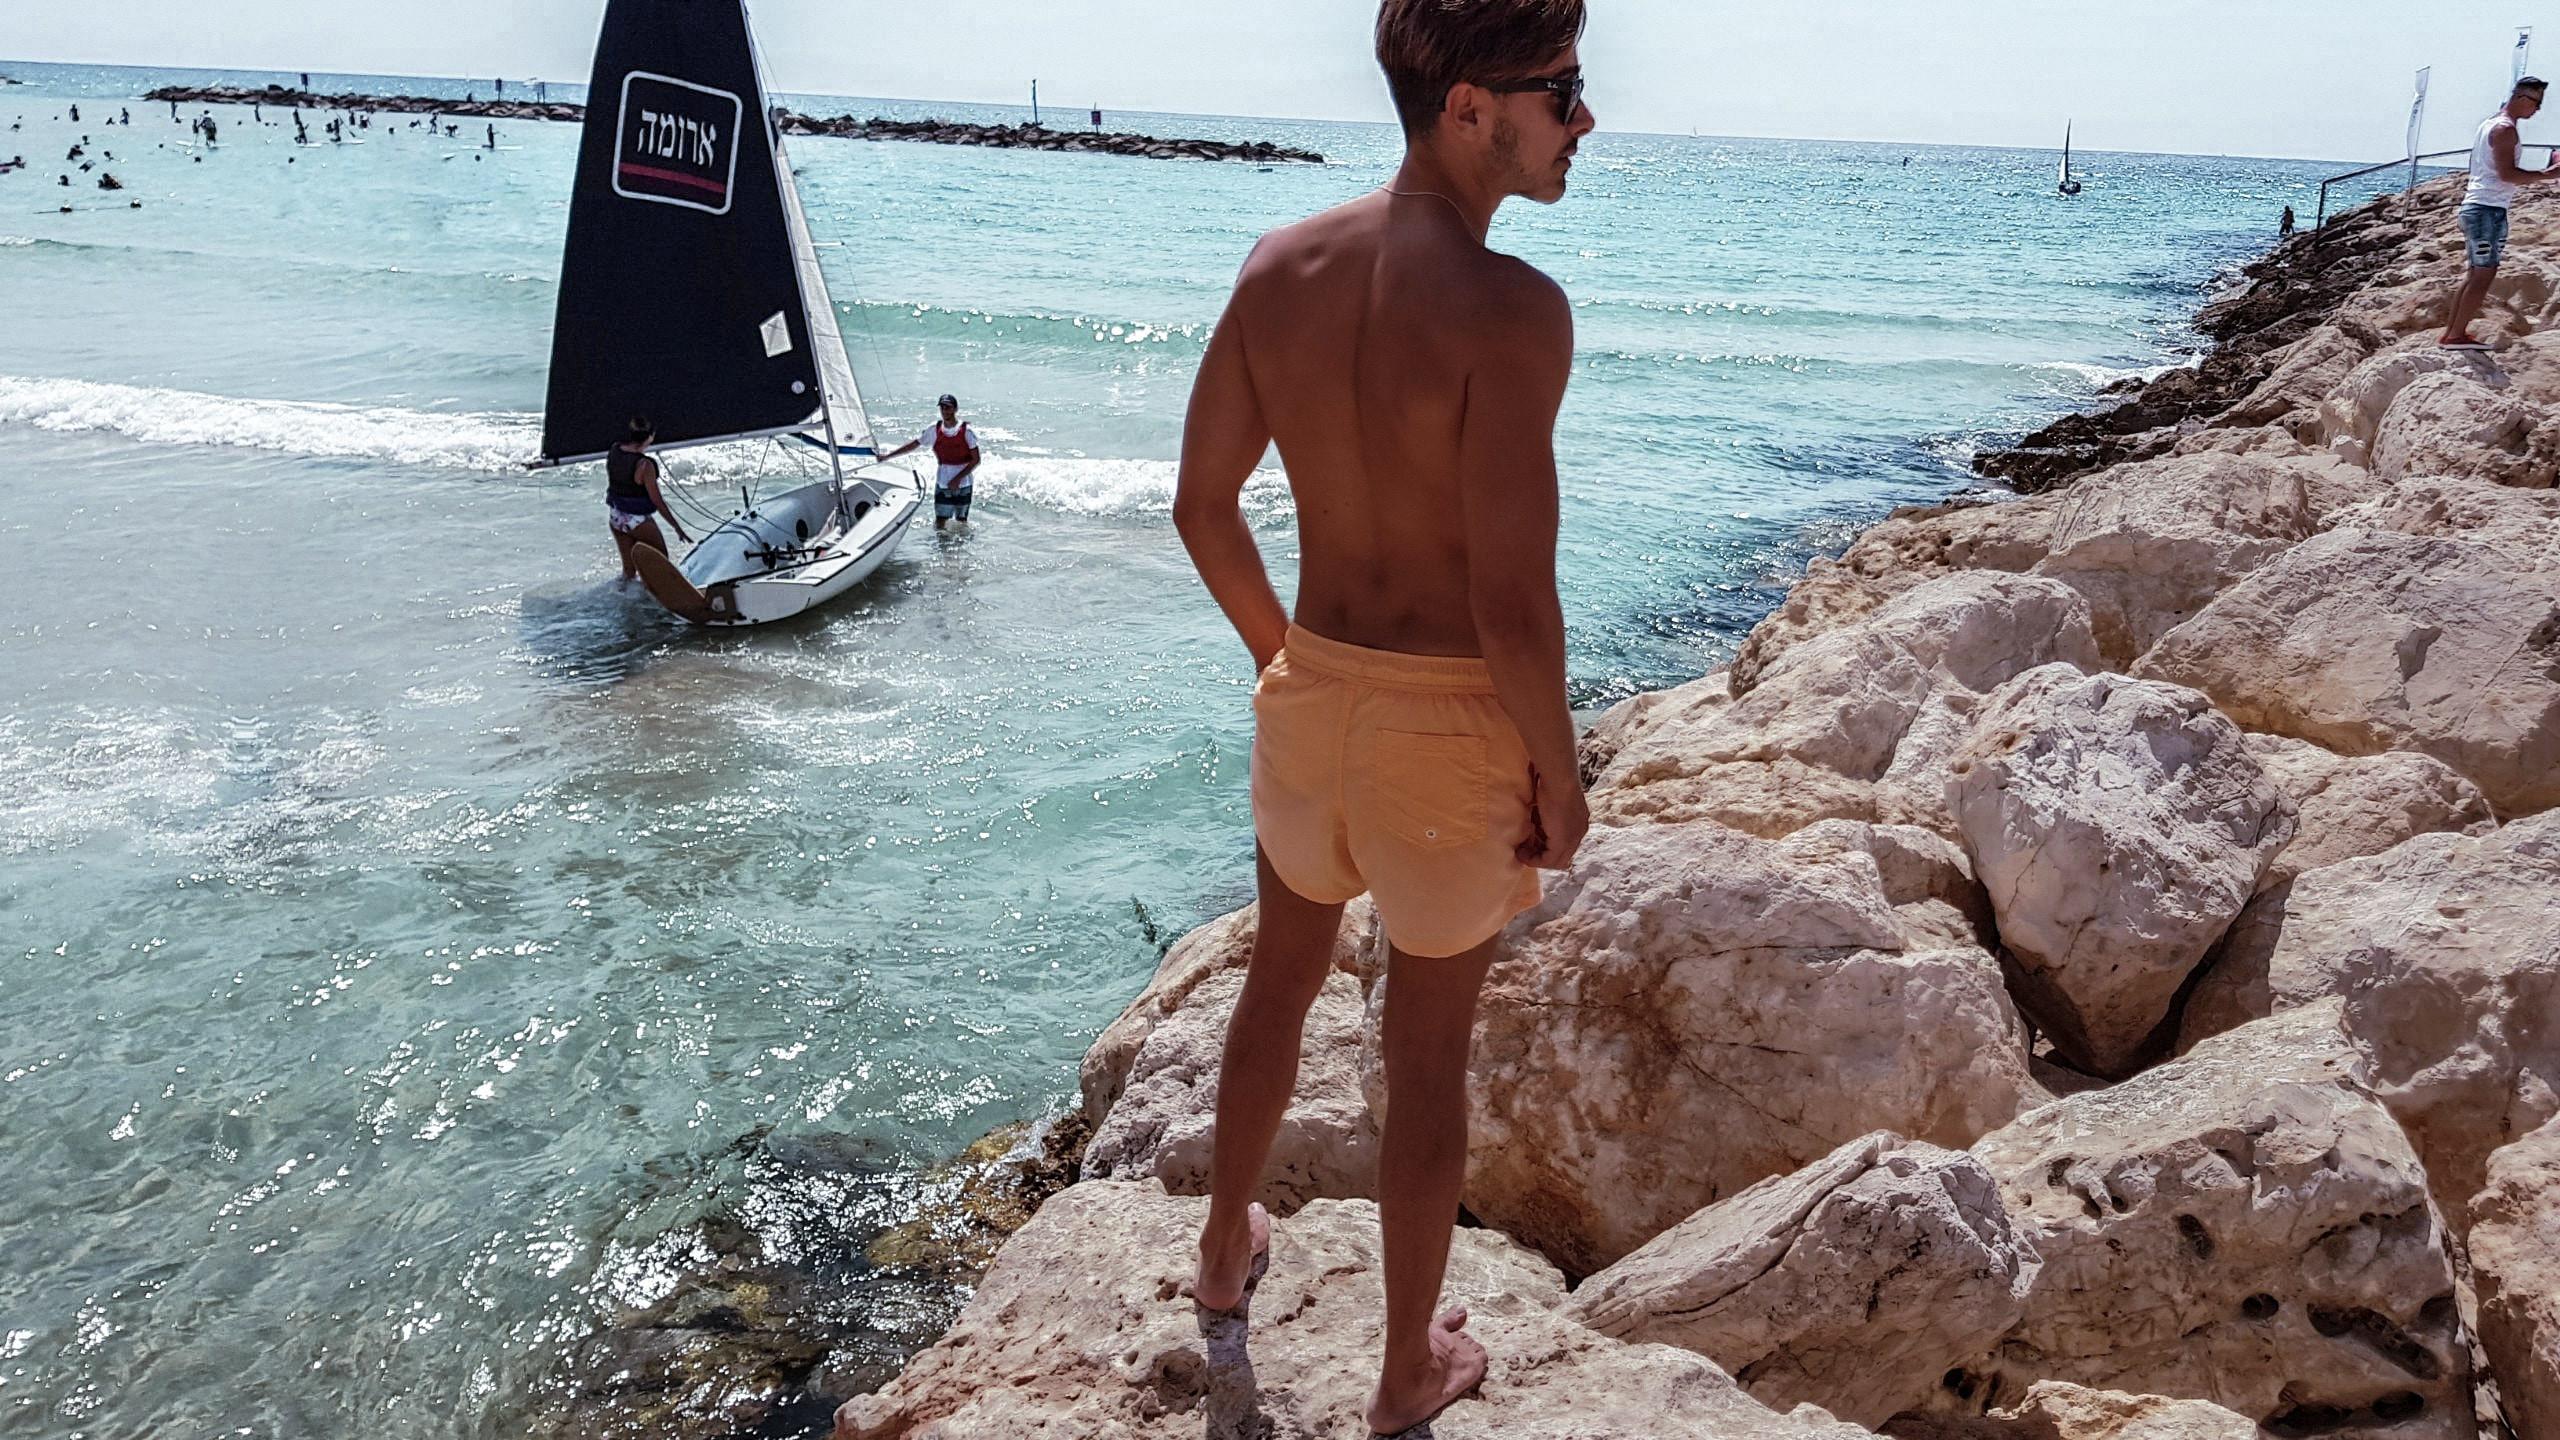 gordon beach tel aviv, israel